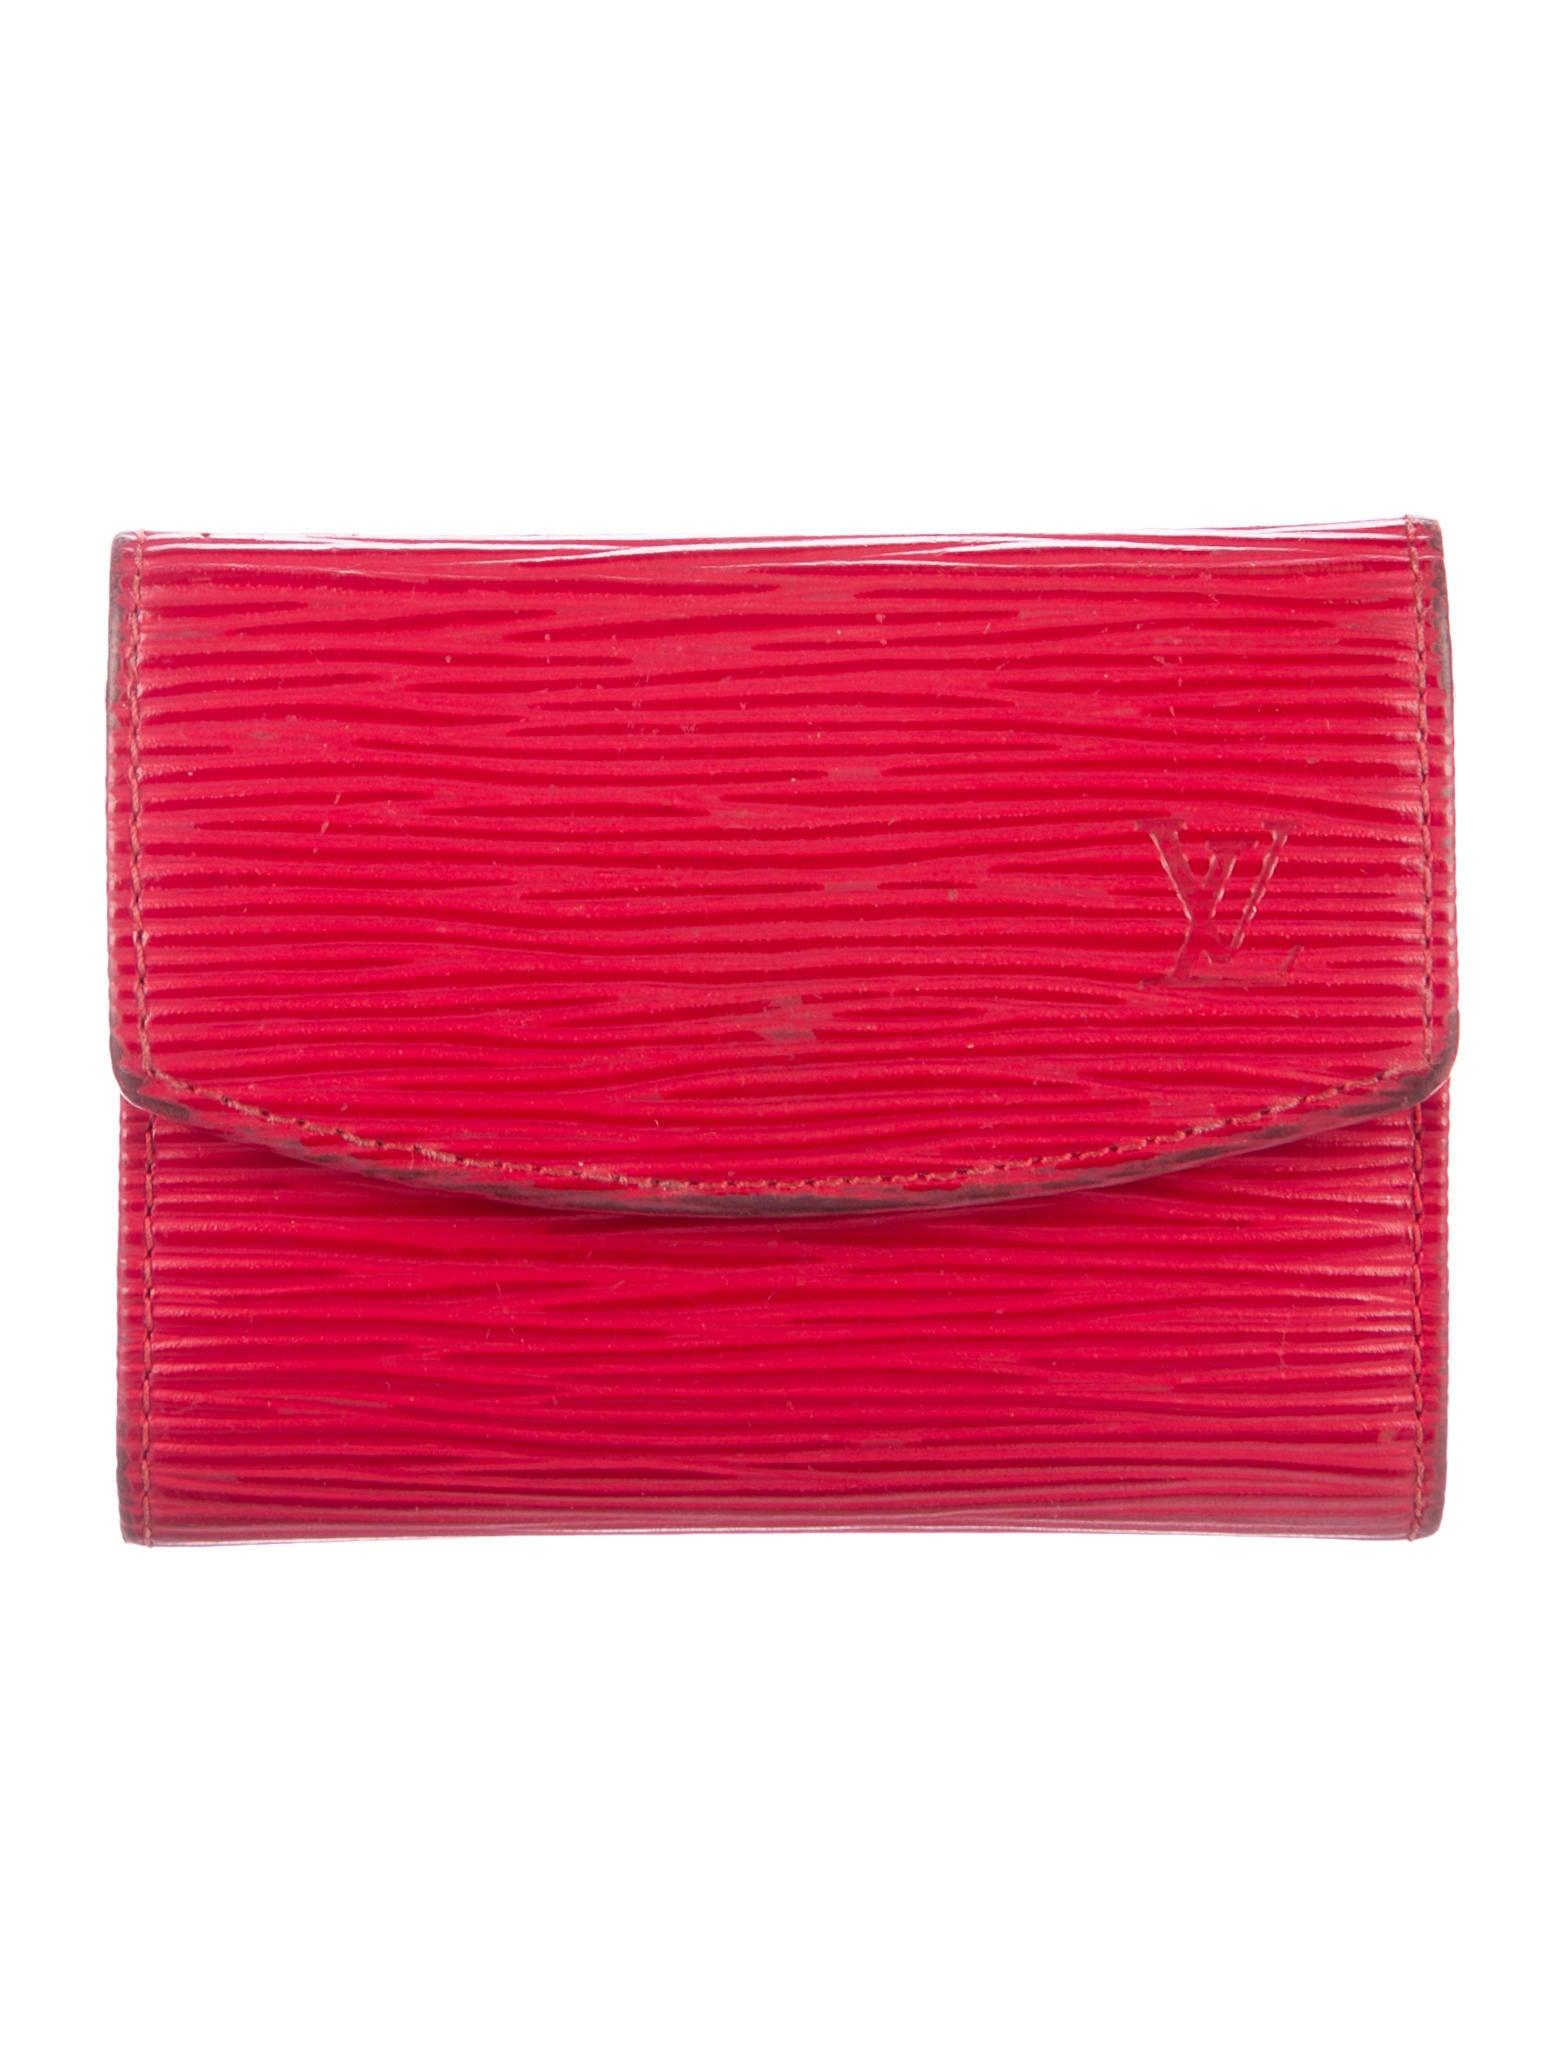 Louis Vuitton Epi Business Card Holder - Accessories - LOU139885 ...